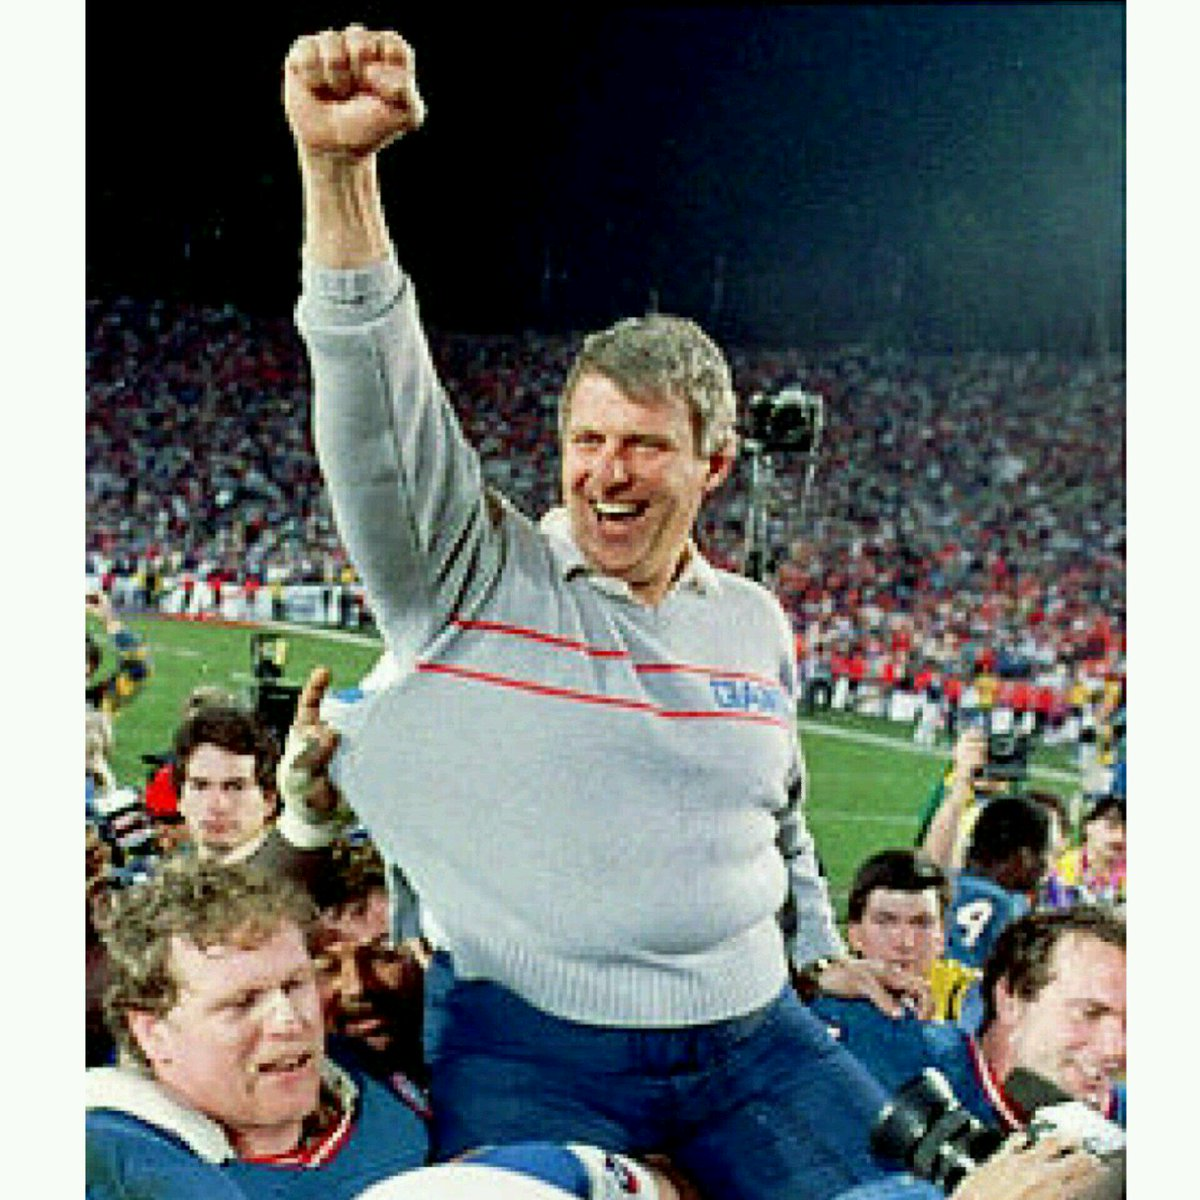 On this date: January 25th, 1987 #GIANTS #21 #BigBlue http://t.co/v3ZQh7zizO